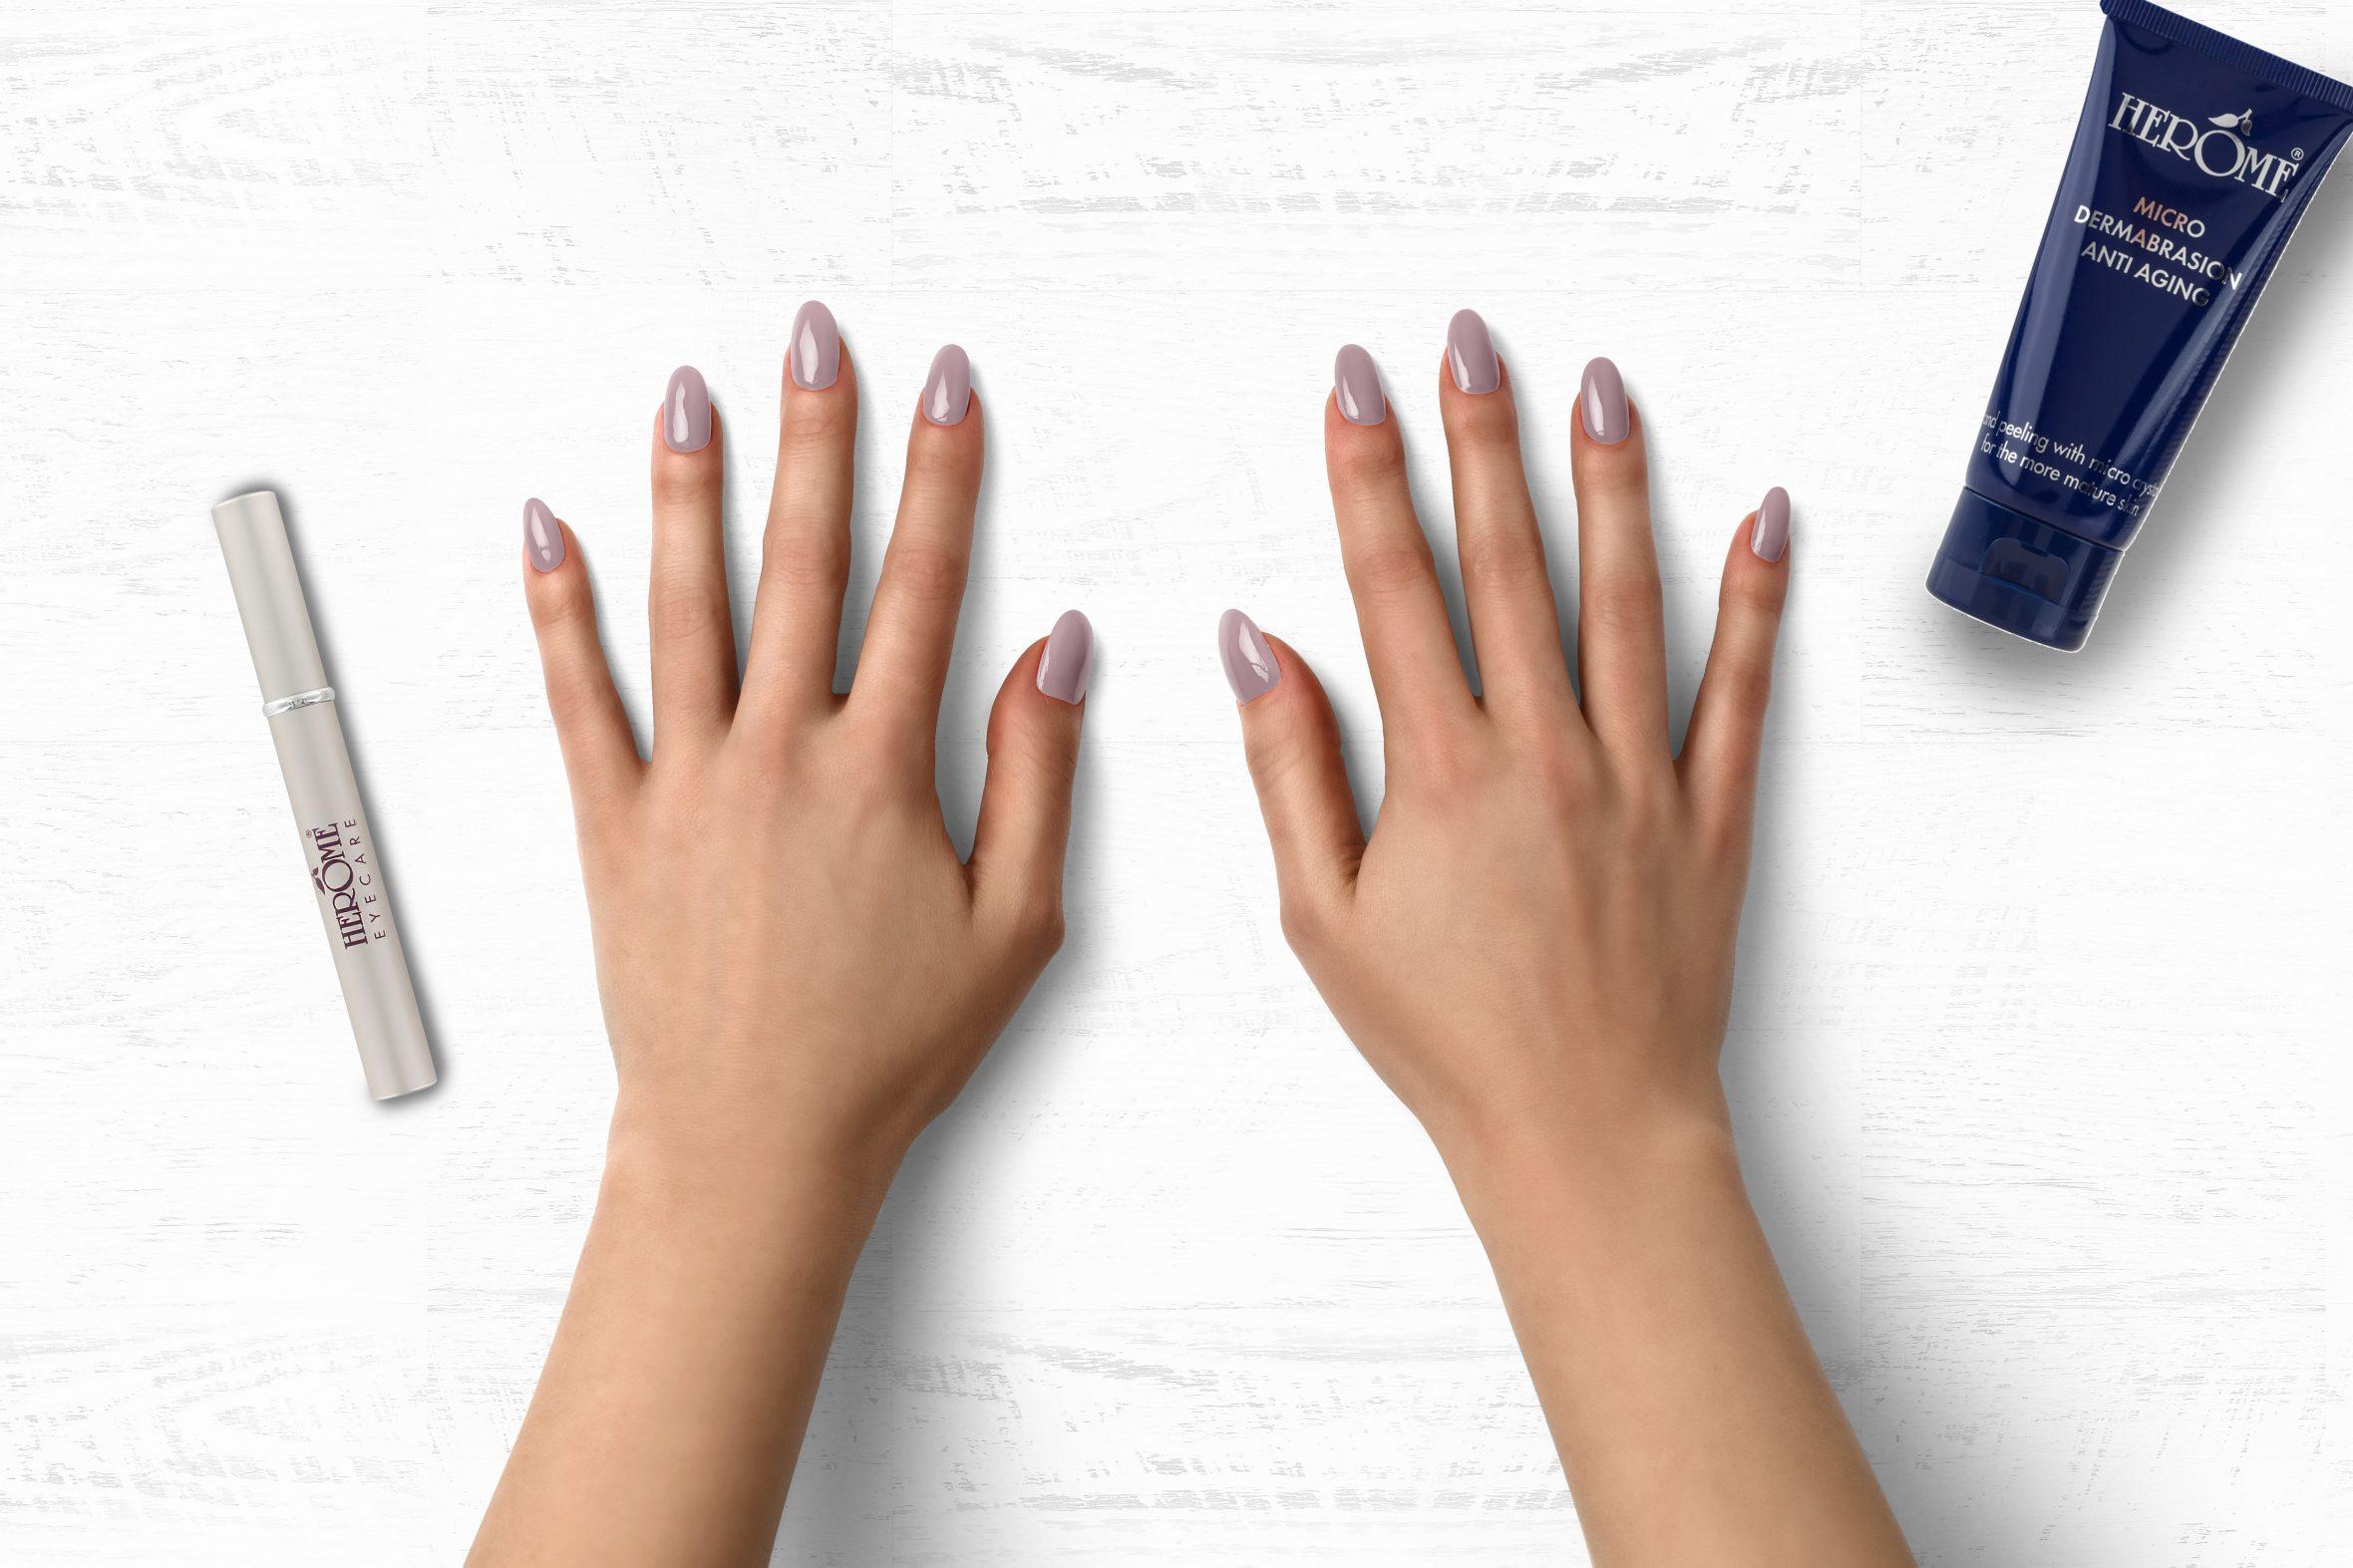 Nude roze nagellak Herôme